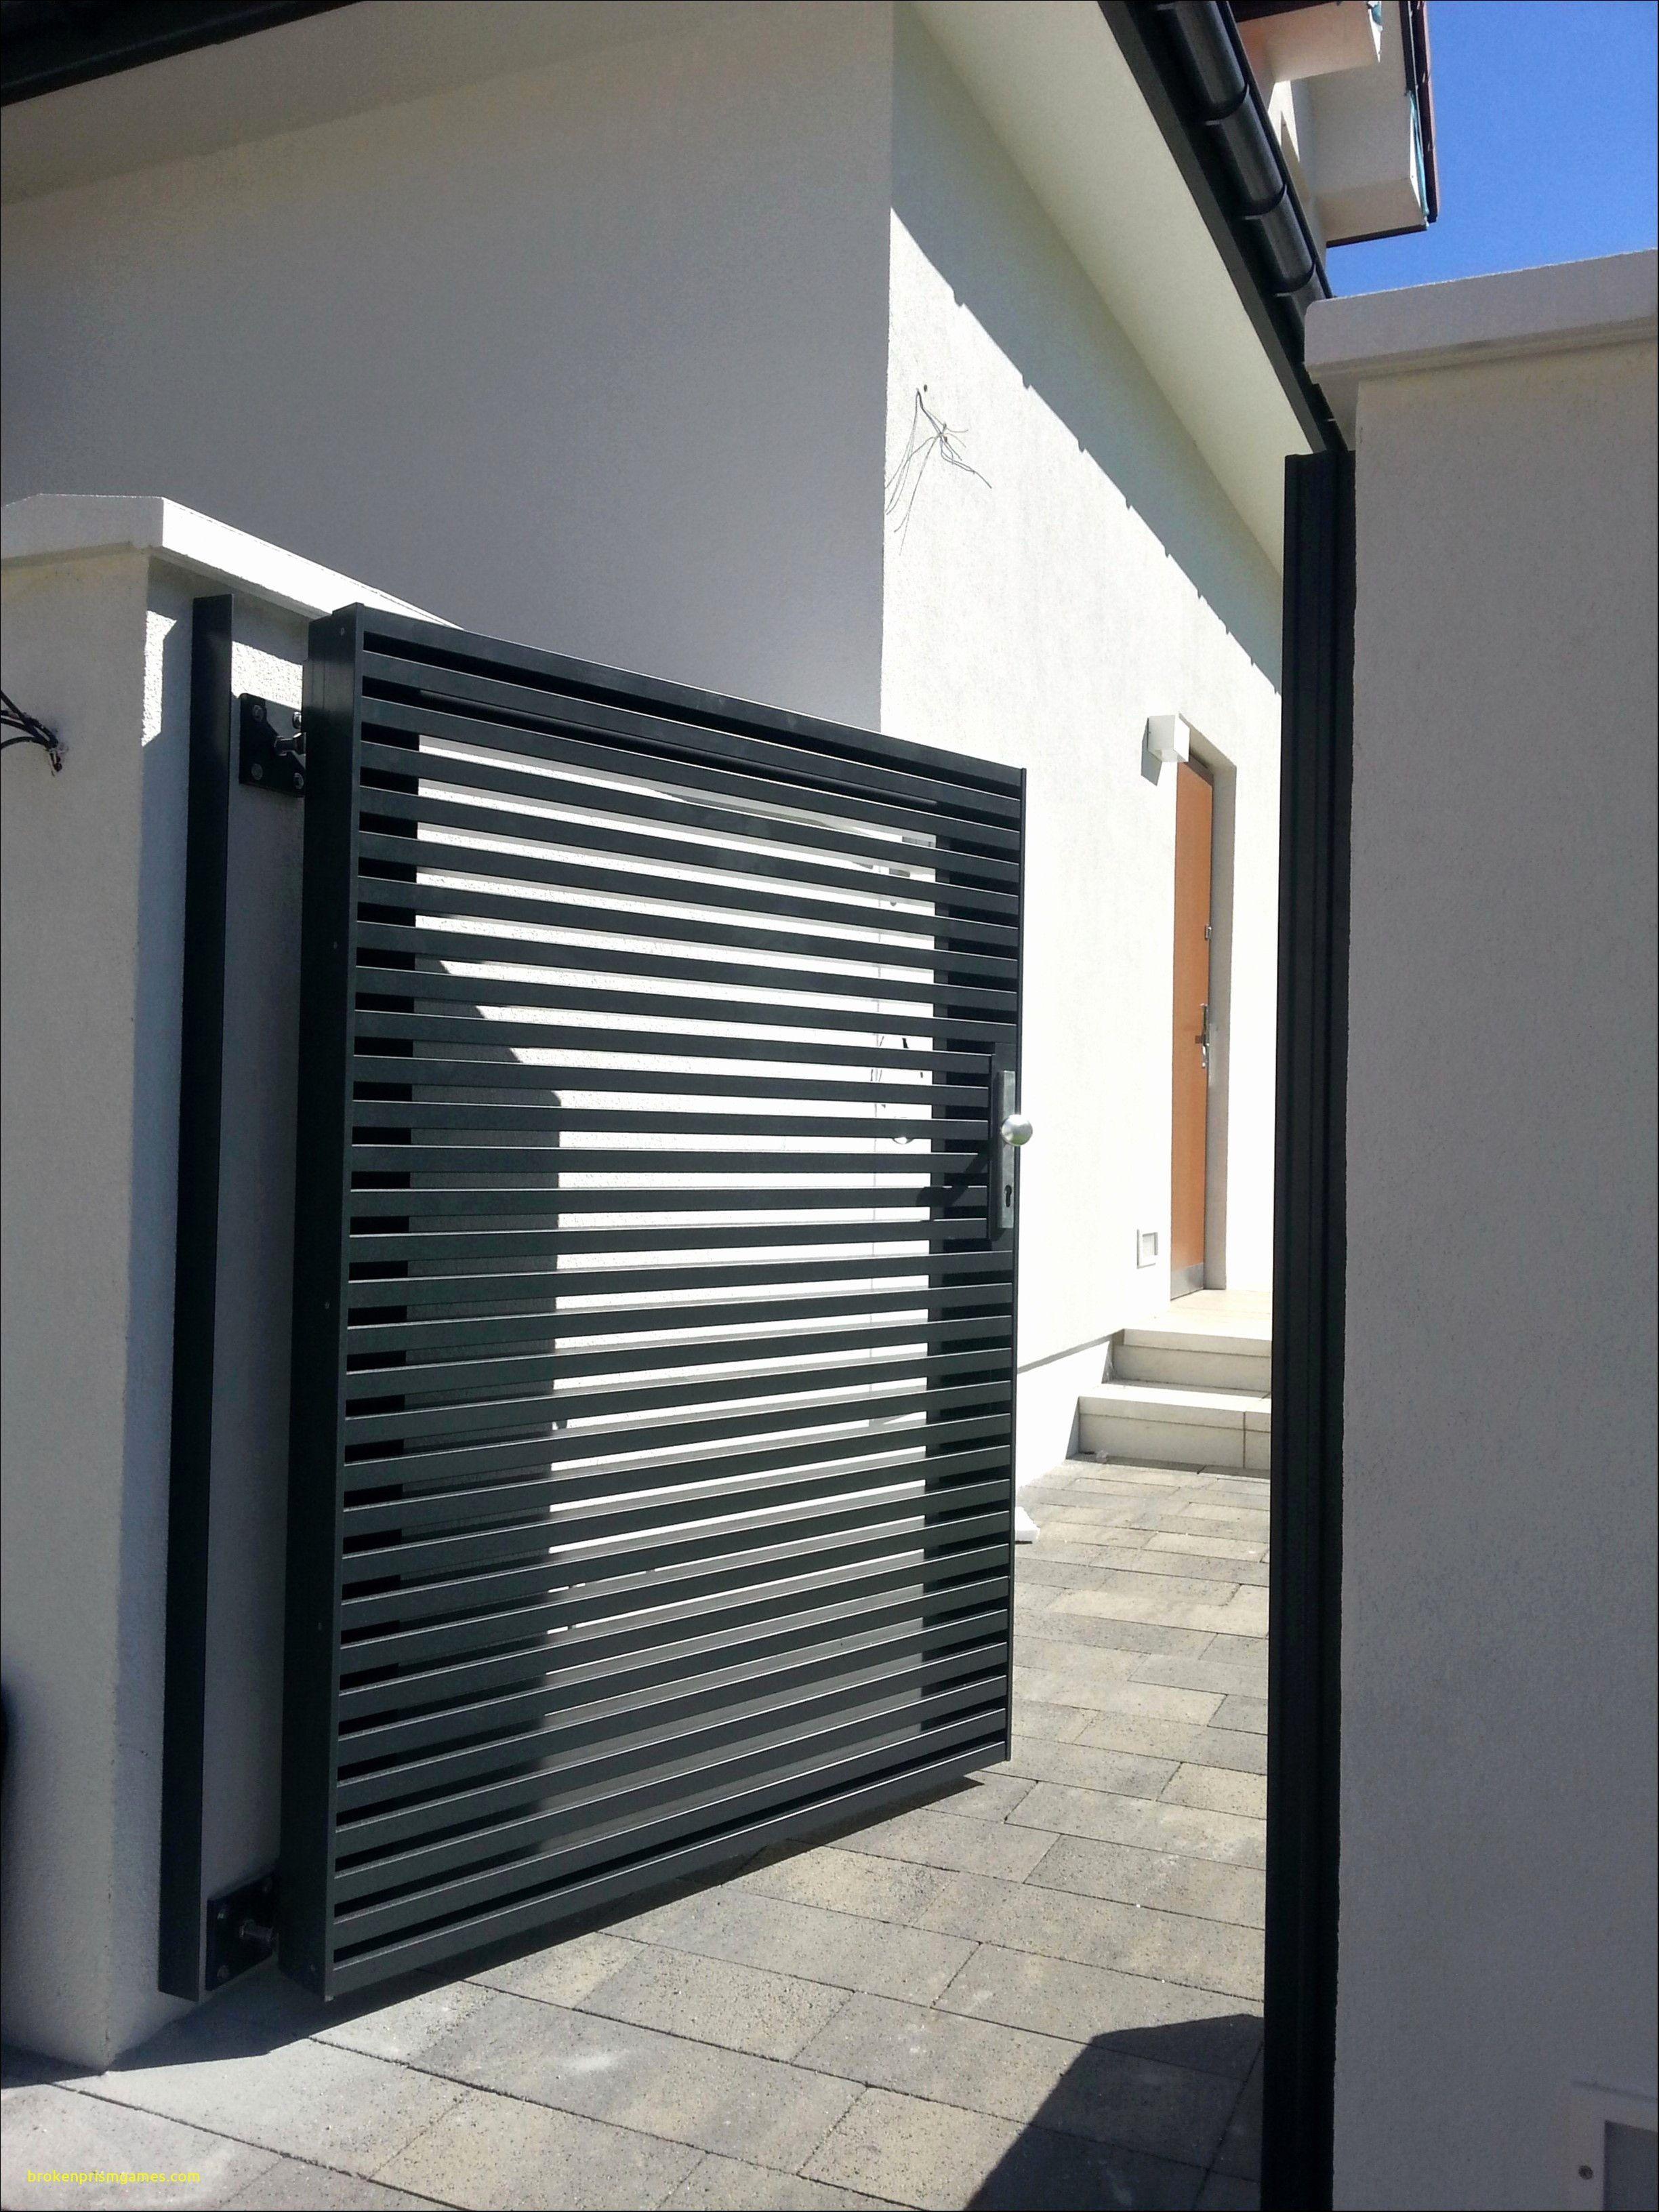 Bambus Sichtschutz Balkon Praktiker Elegant Gartentor Metall Obi